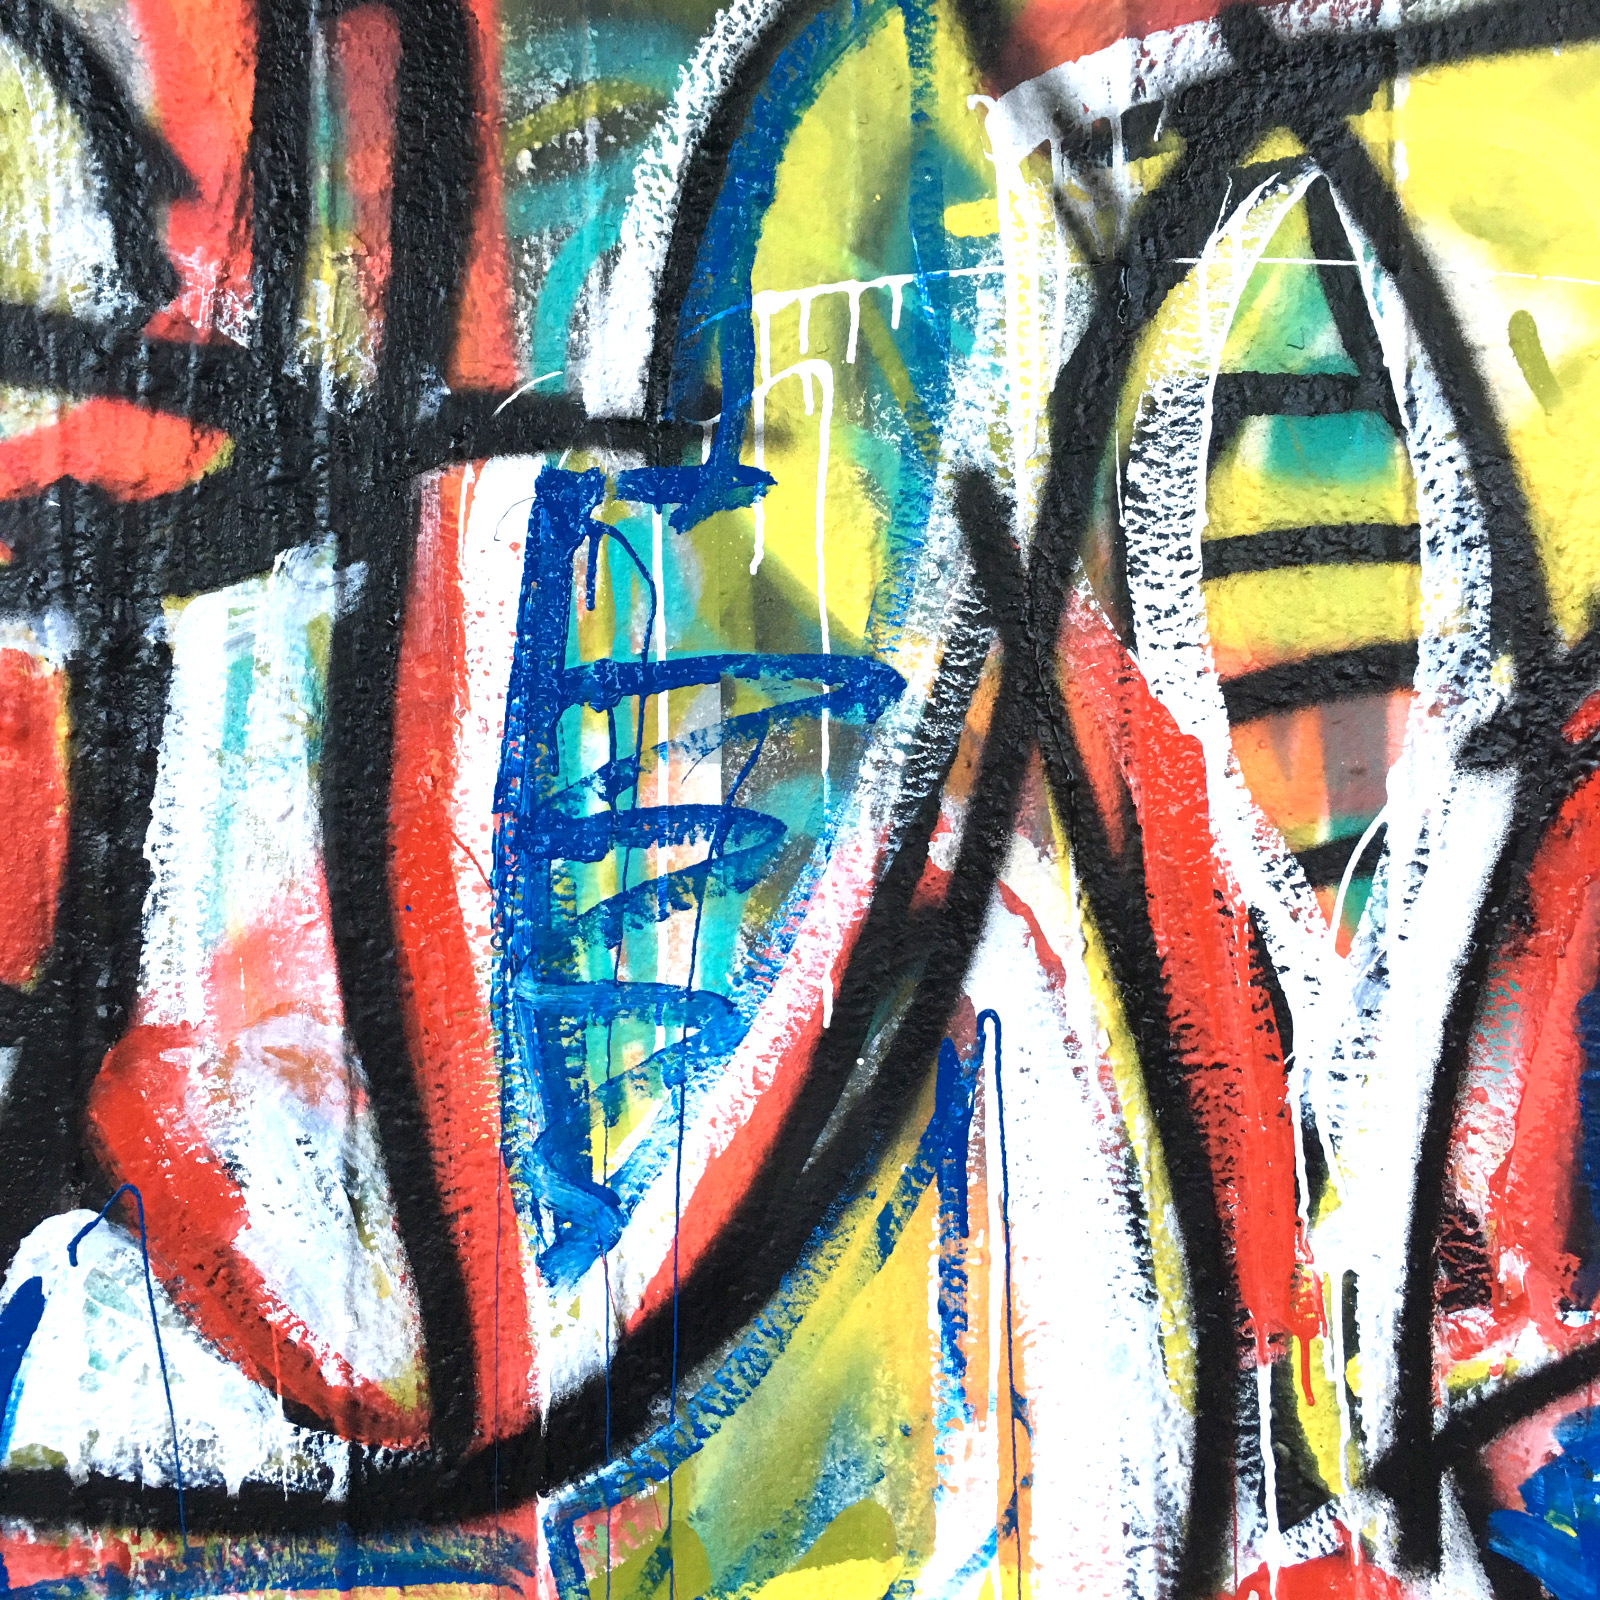 Rob_Adalierd_Painting_Vienna_Abstract_Contemporary_Street_art_5.jpg